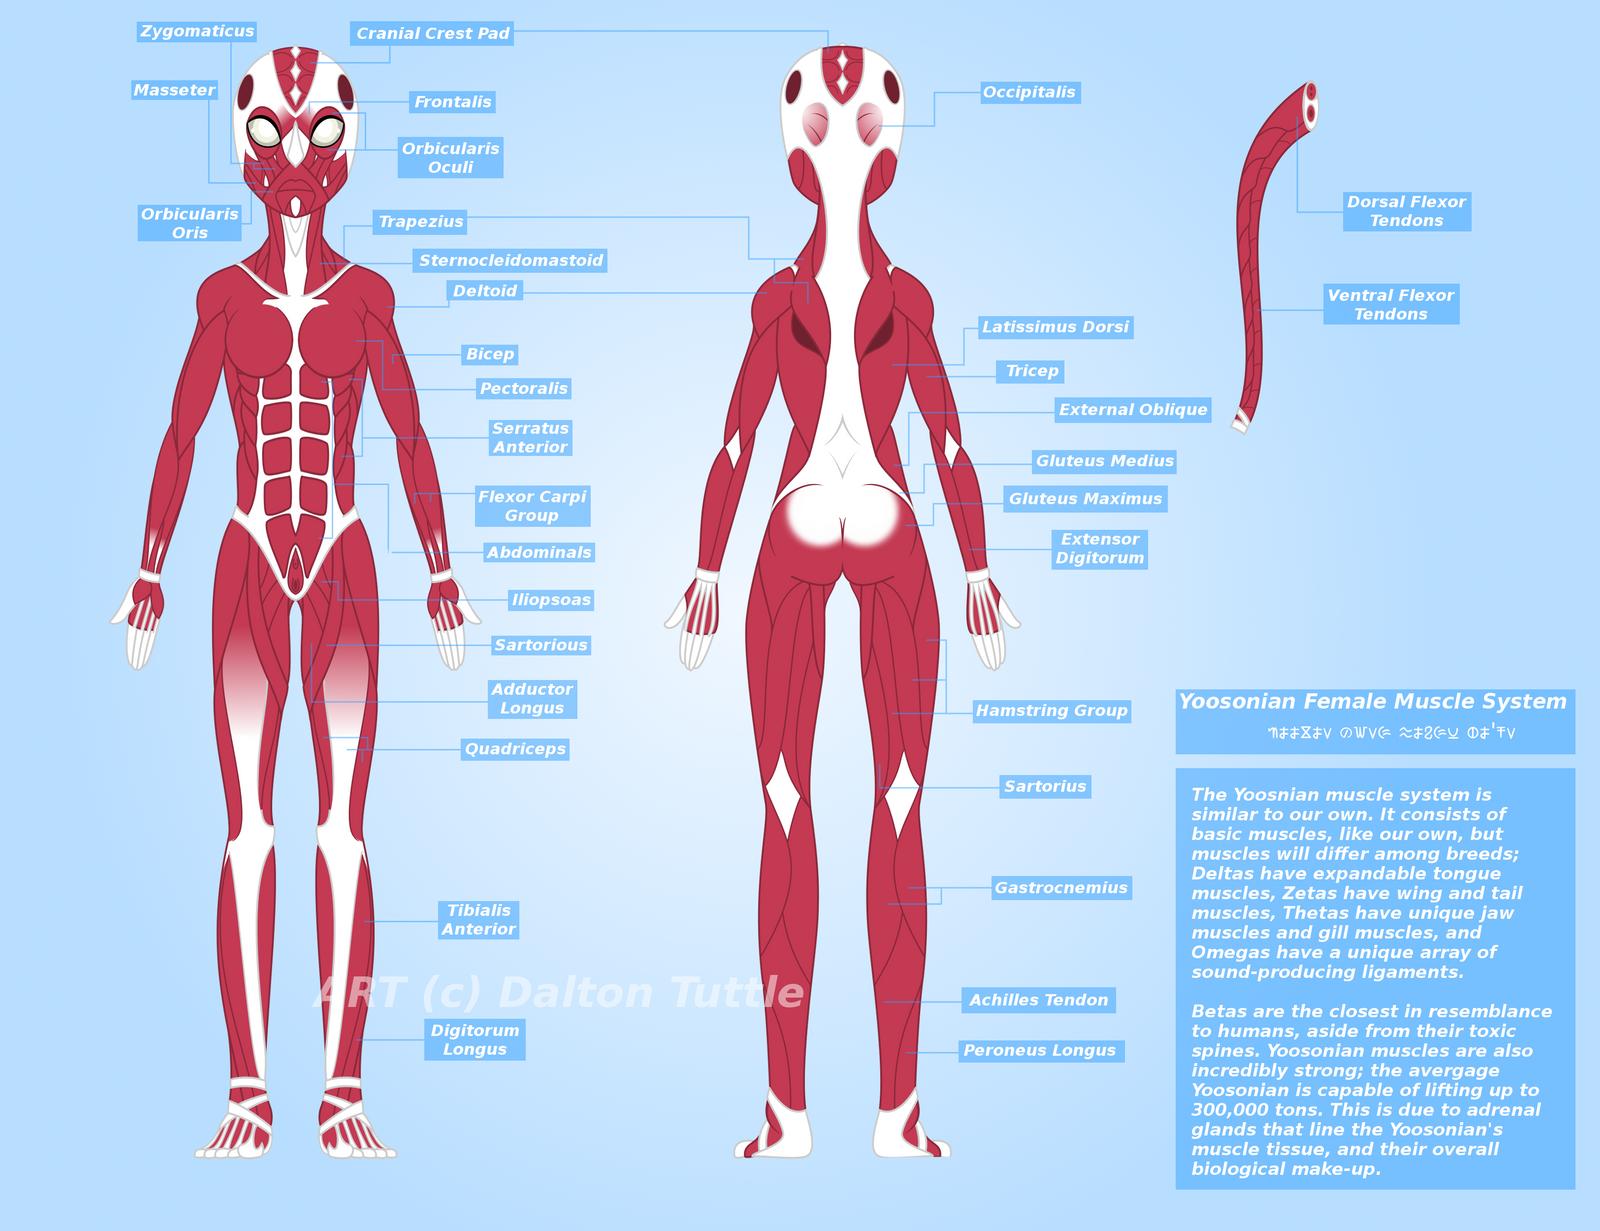 yoosonian muscular system (female) by doctoryoosonian on deviantart, Muscles